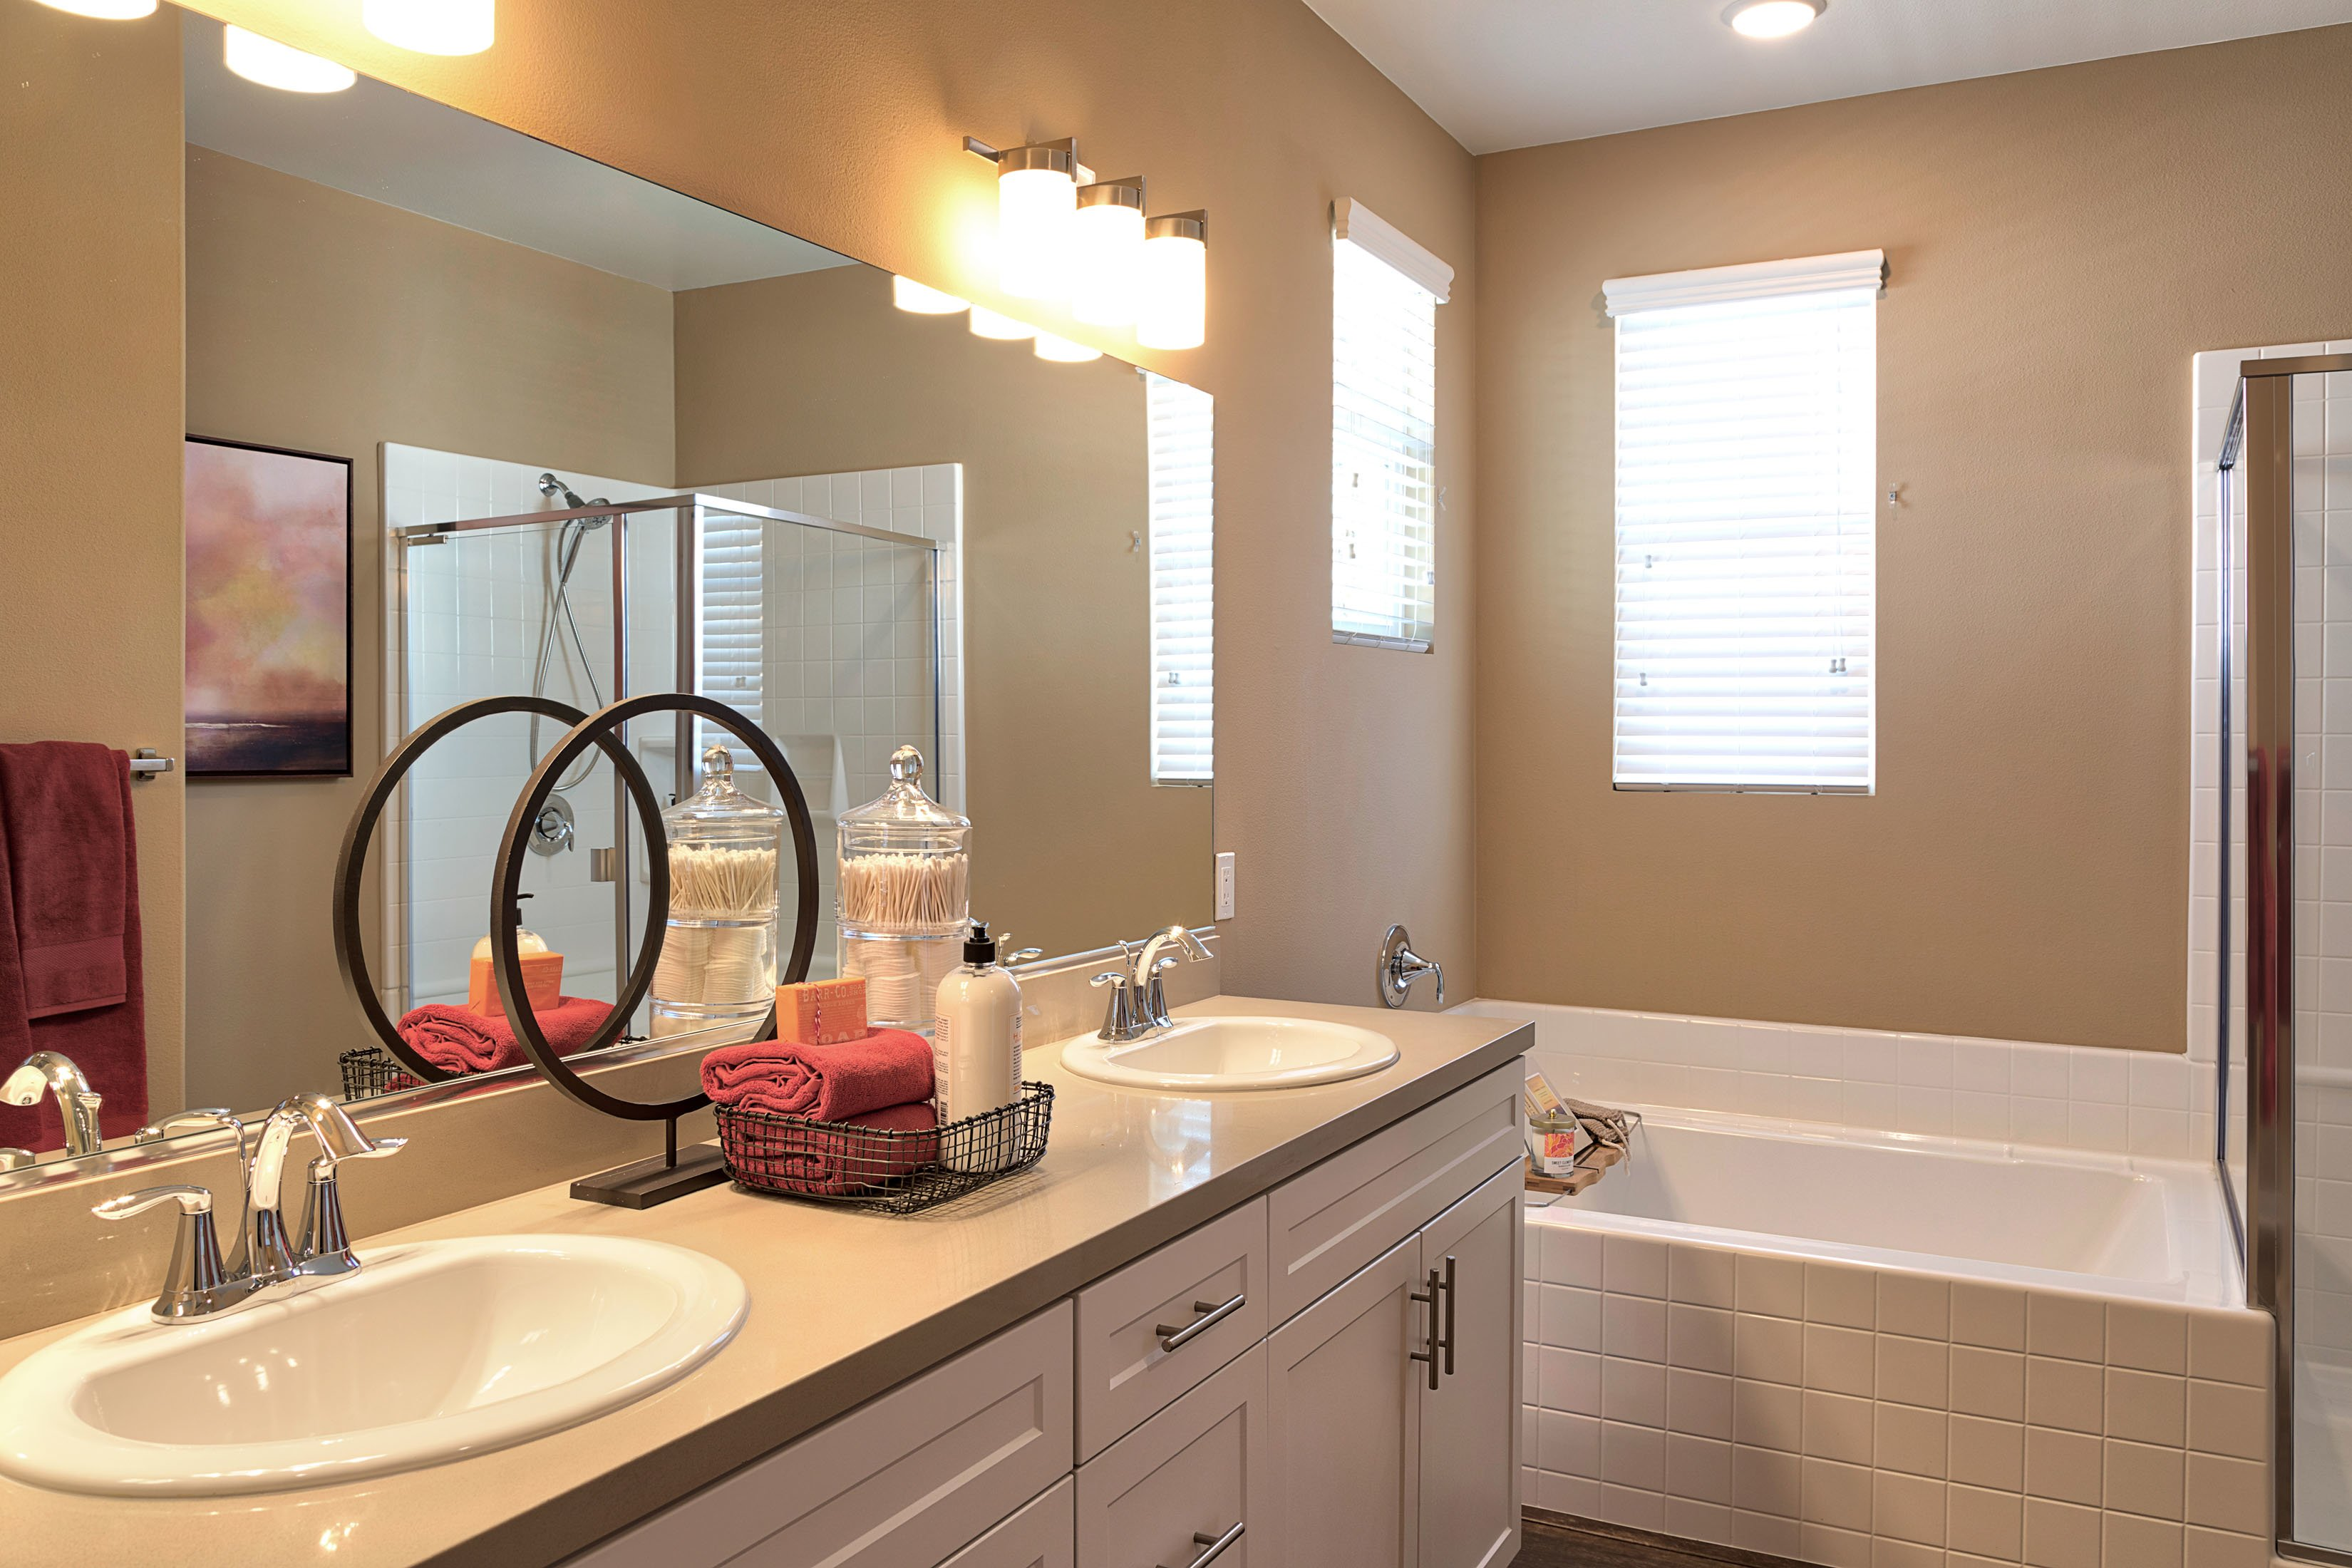 Chino Hills Apartments For Rent | Santa Barbara In Chino Hills